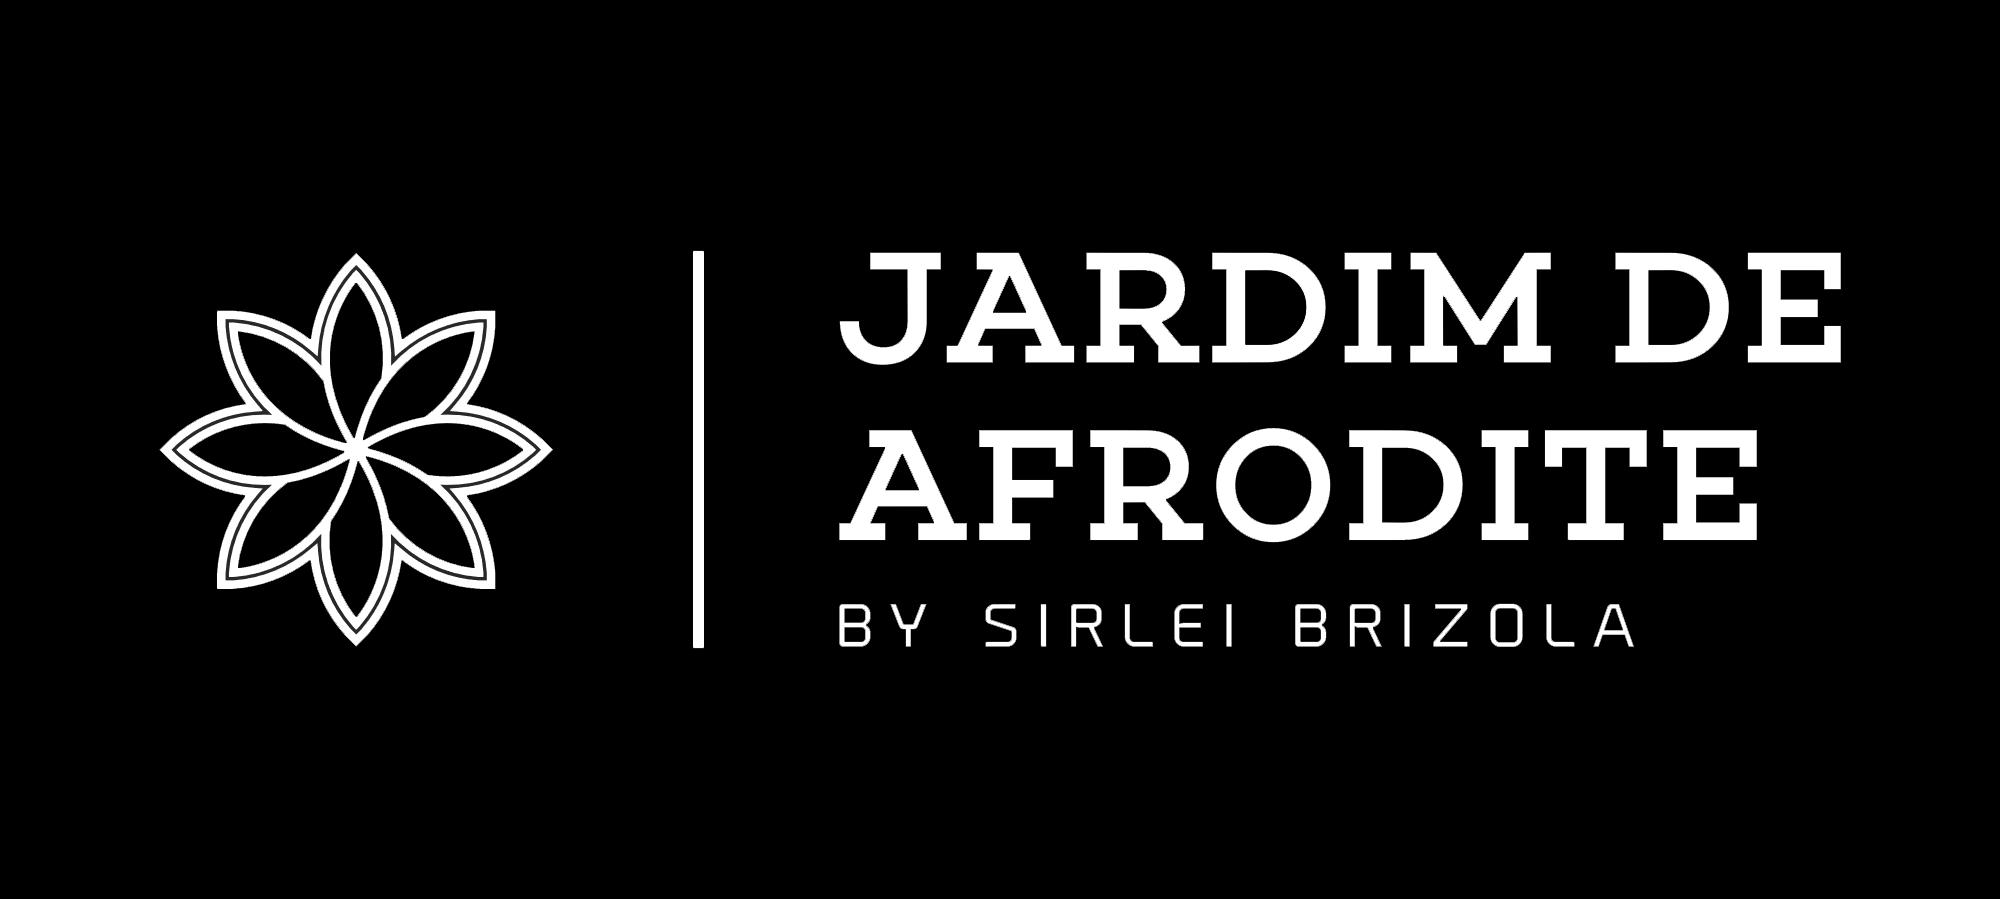 Contate Jardim de Afrodite - Sirlei Brizola